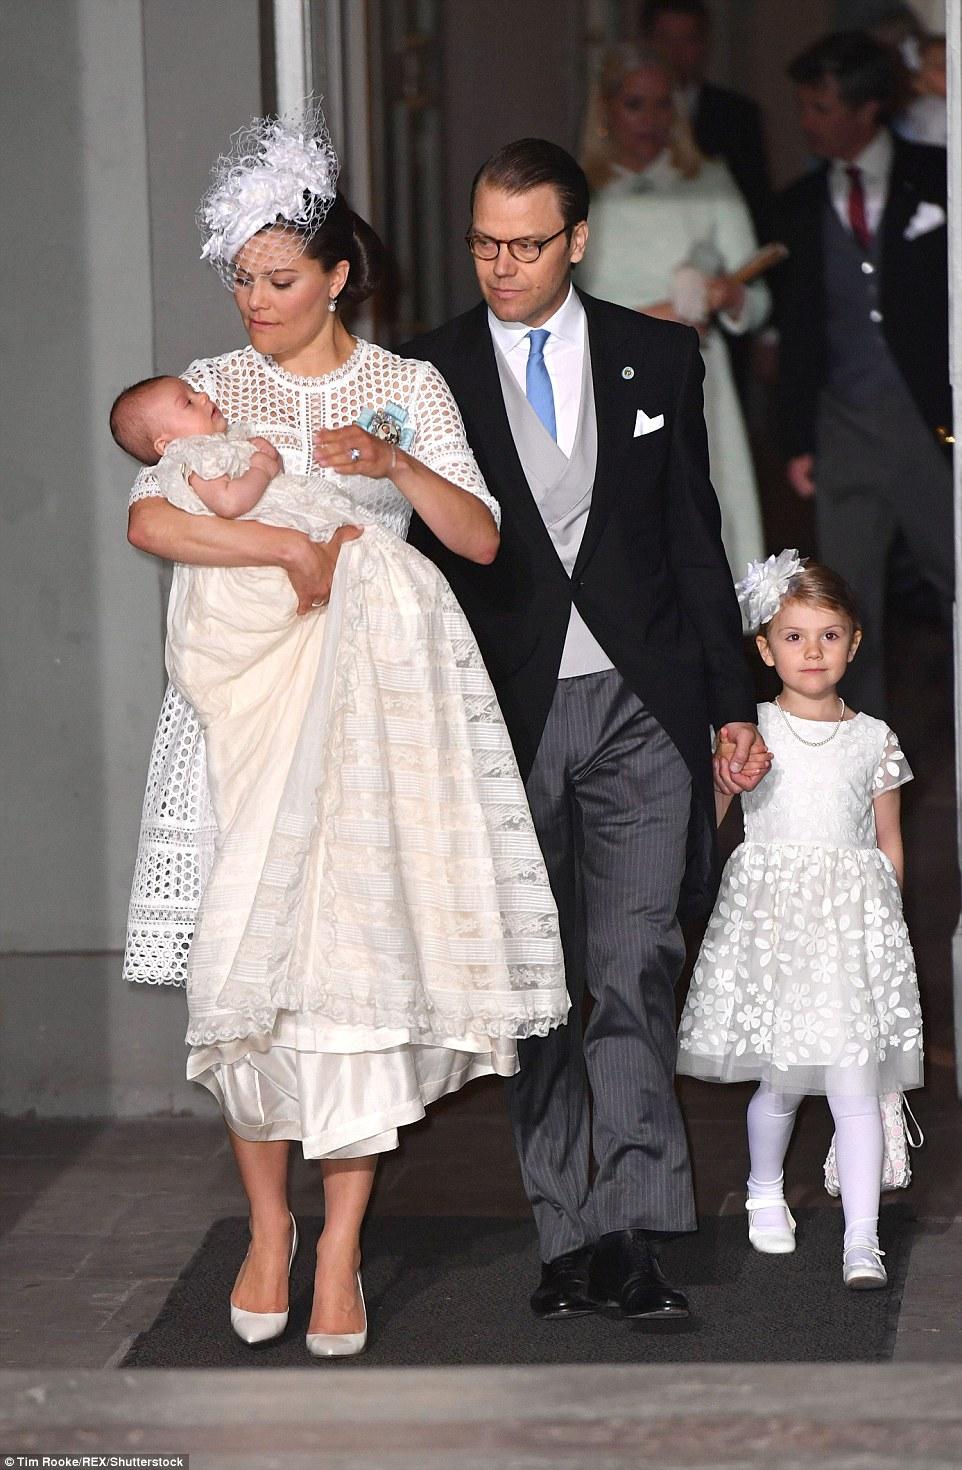 Як шведська принцеса сина хрестила - фото 2